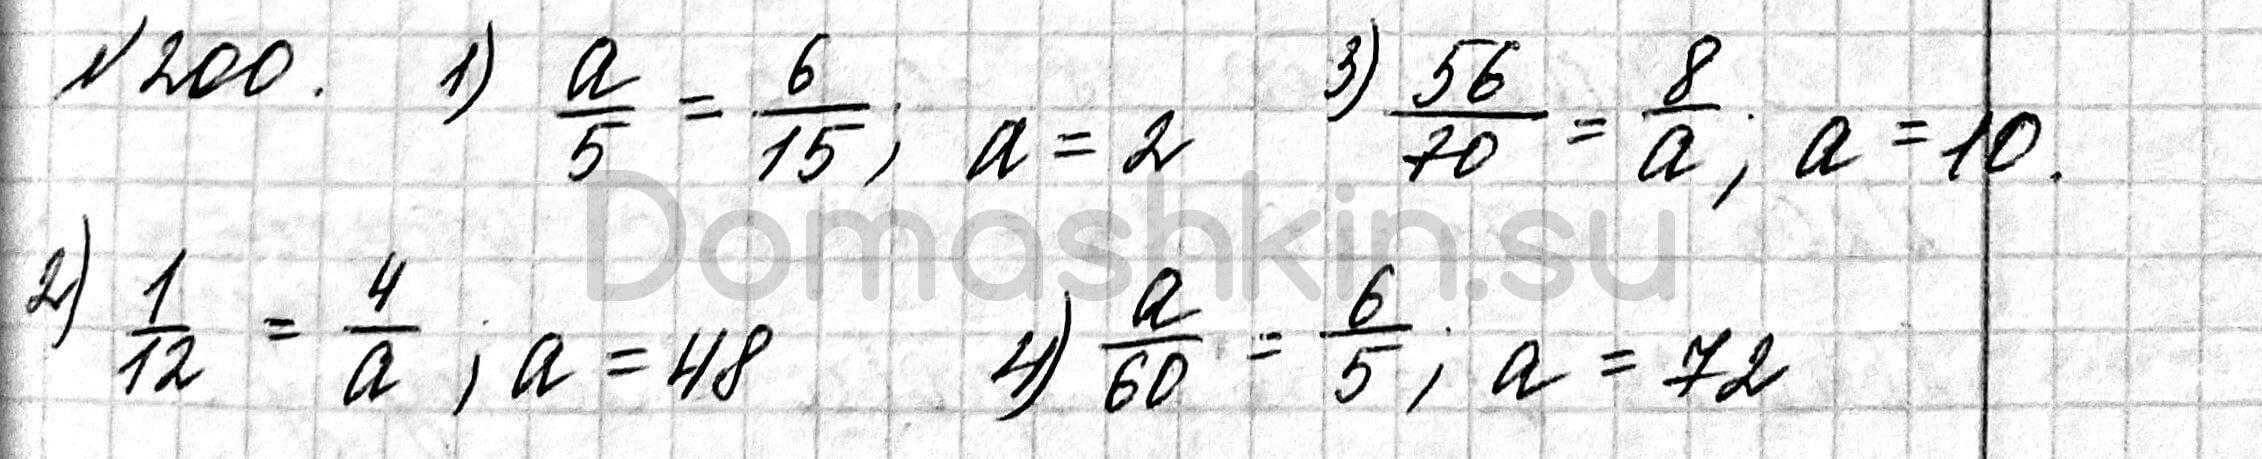 Математика 6 класс учебник Мерзляк номер 200 решение